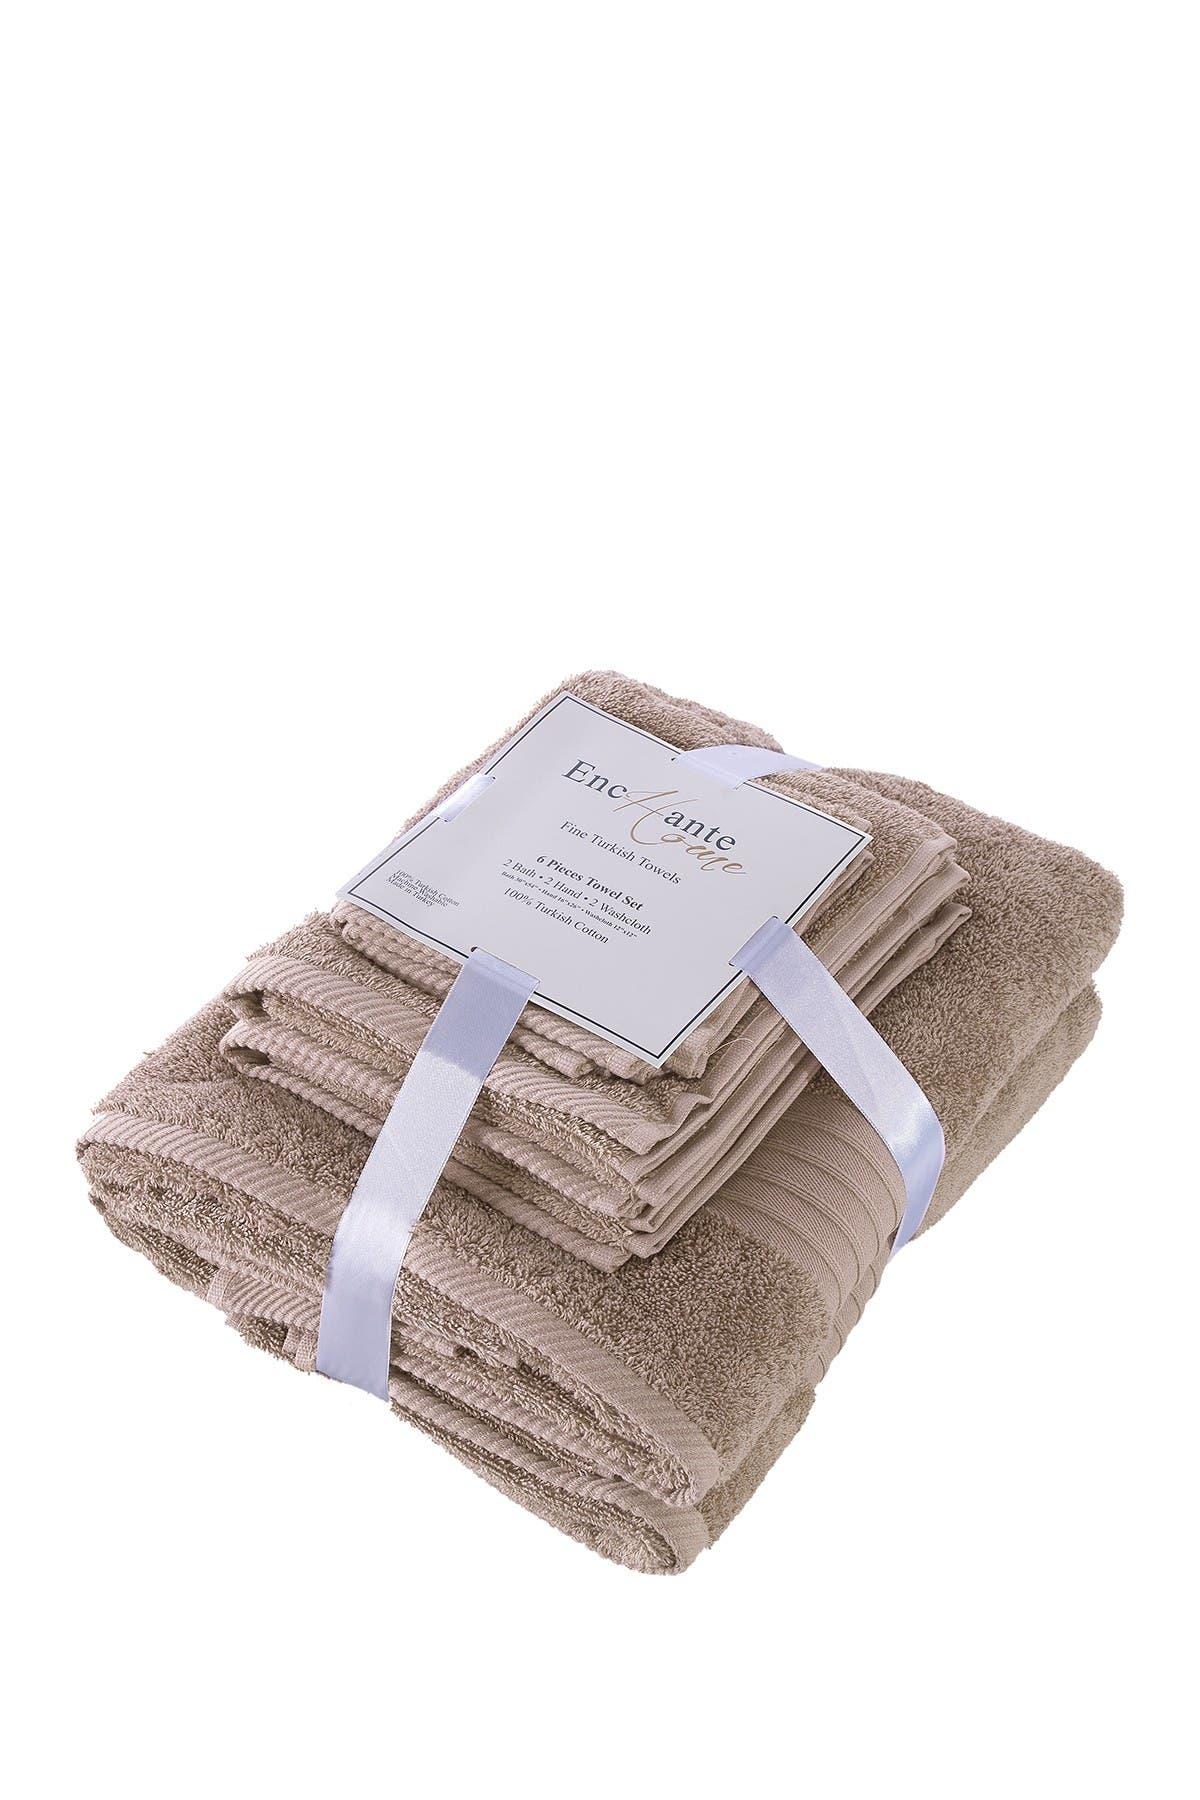 Image of ENCHANTE HOME Luna Turkish Towel 6-Piece Set